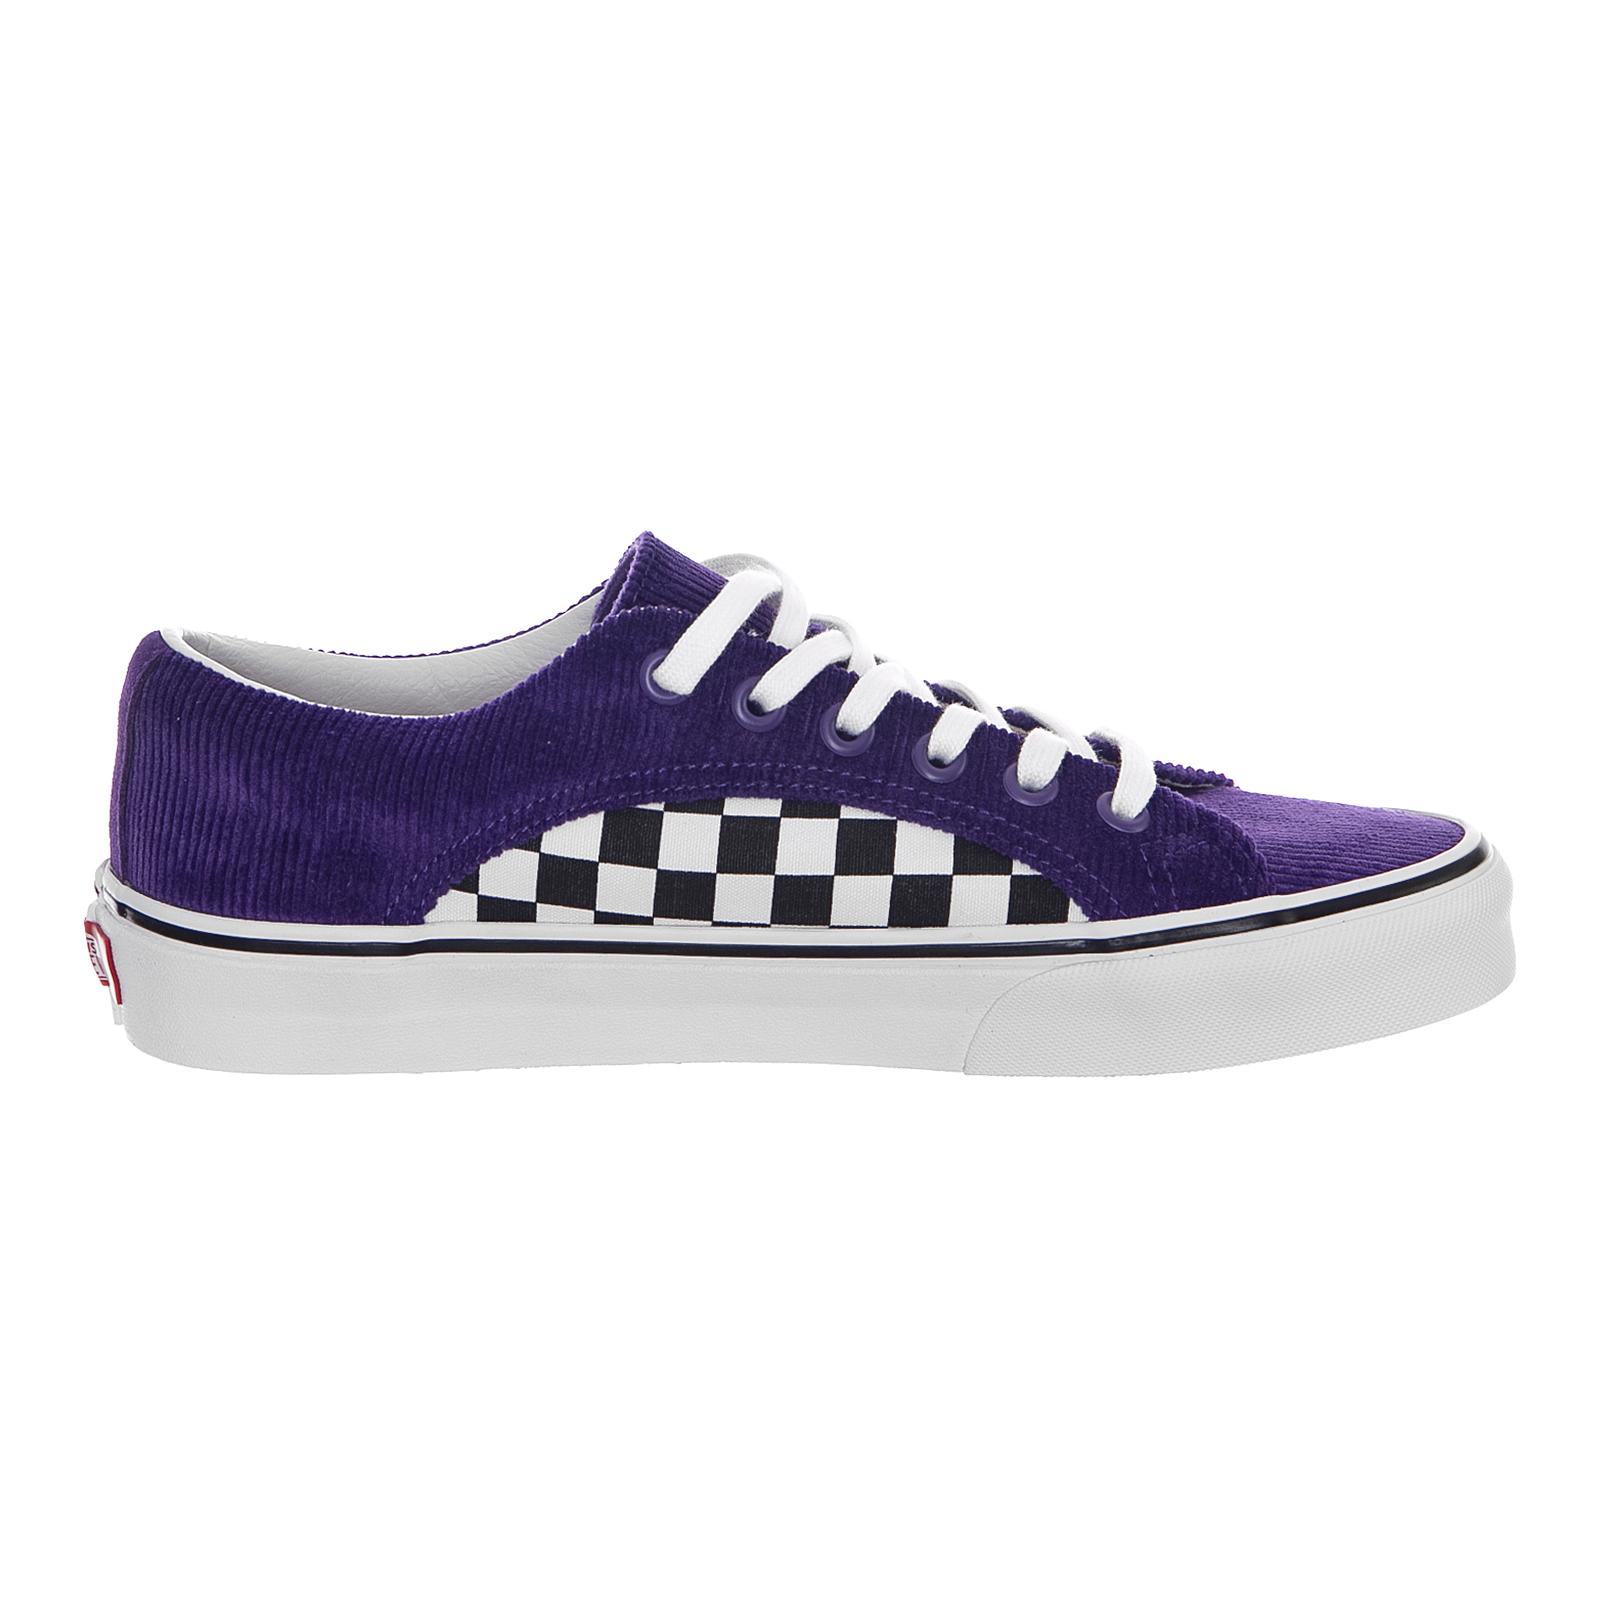 Vans-Sneakers-Ua-Lampin-Checker-Cord-Multicolor